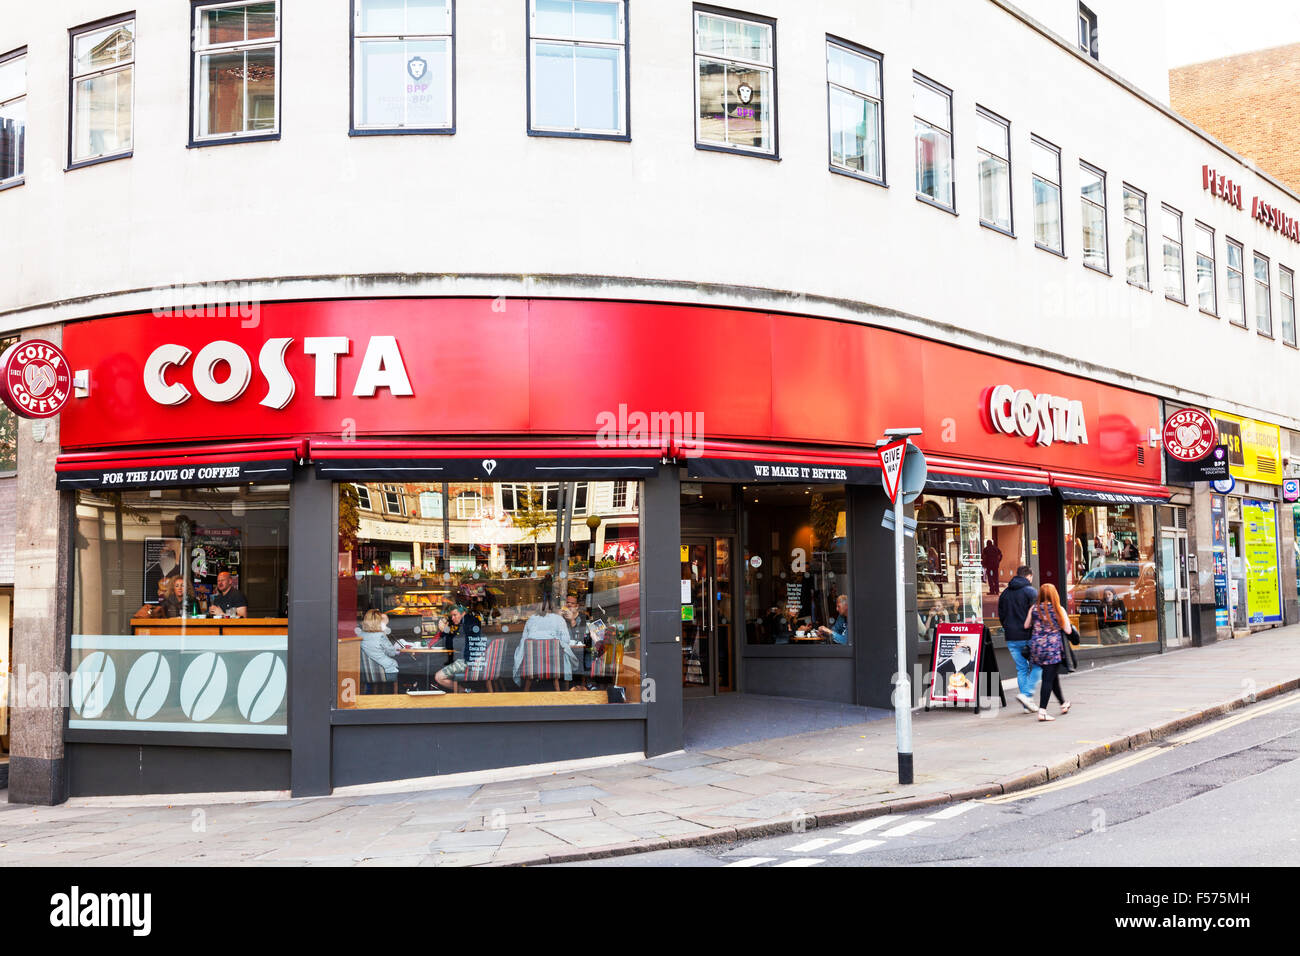 81648a709e7a Costa coffee chain Shop store name sign building exterior facade entrance  Nottingham City centre UK GB England Nottinghamshire